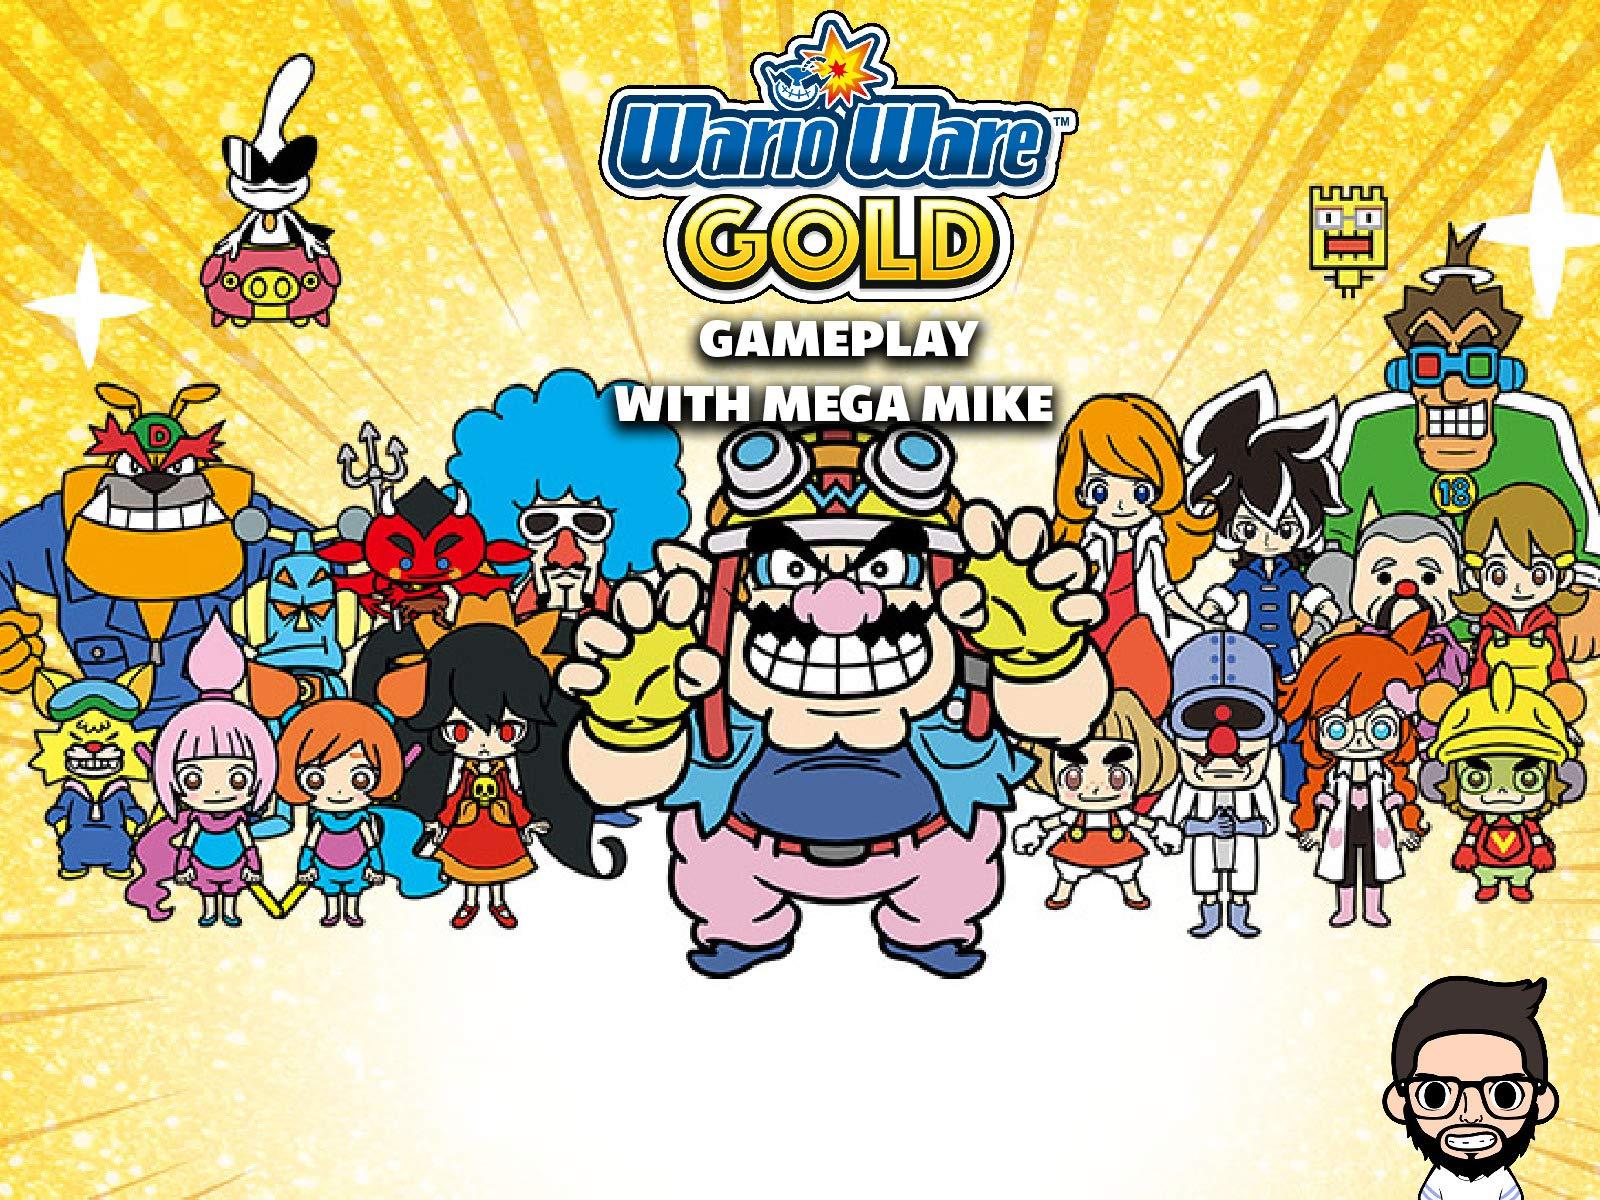 Wario Ware Gold Gameplay With Mega Mike - Season 1